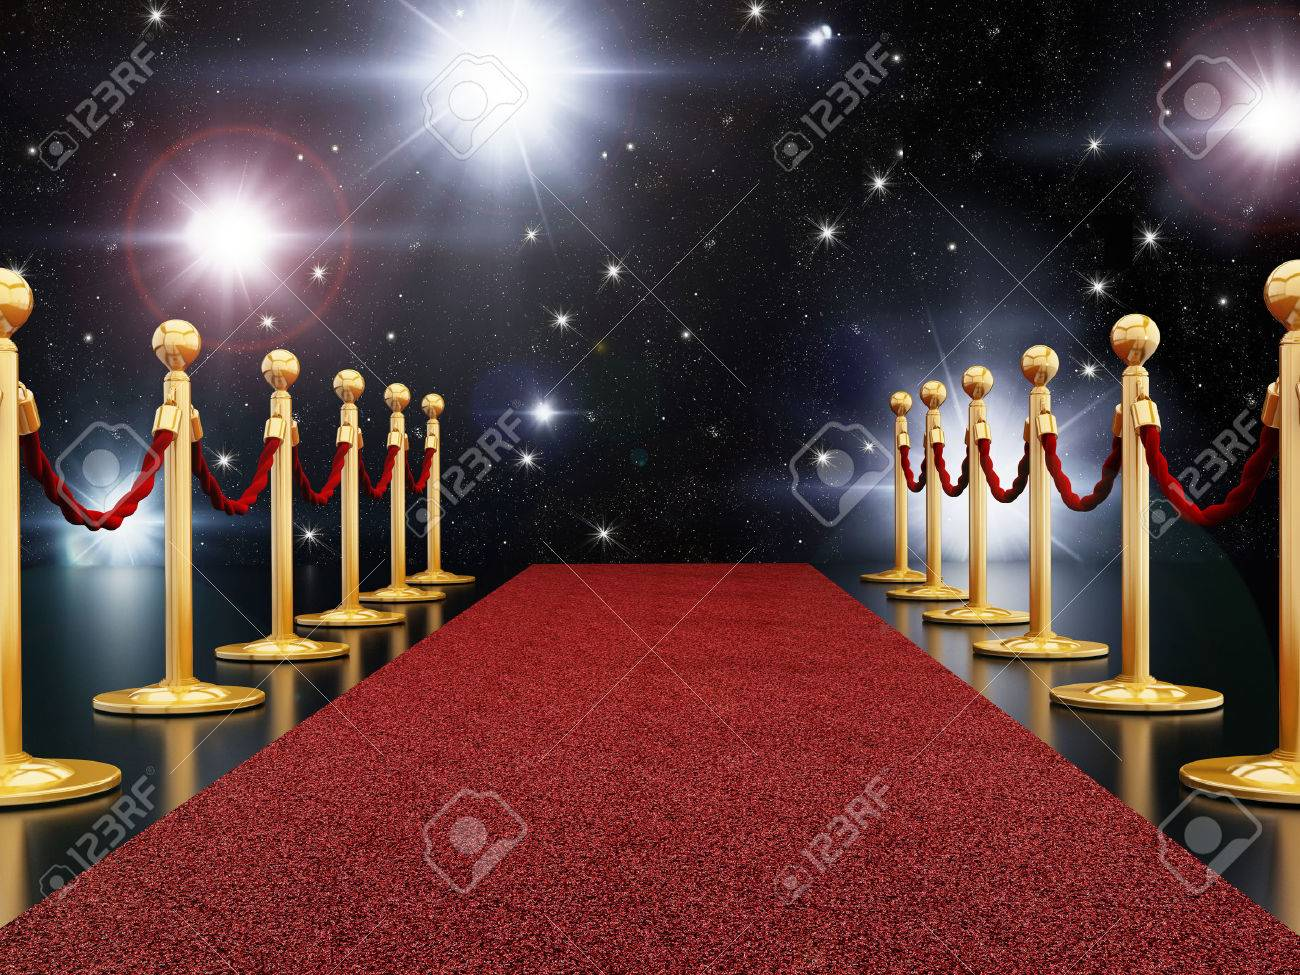 Red carpet night Stock Photo - 29269415